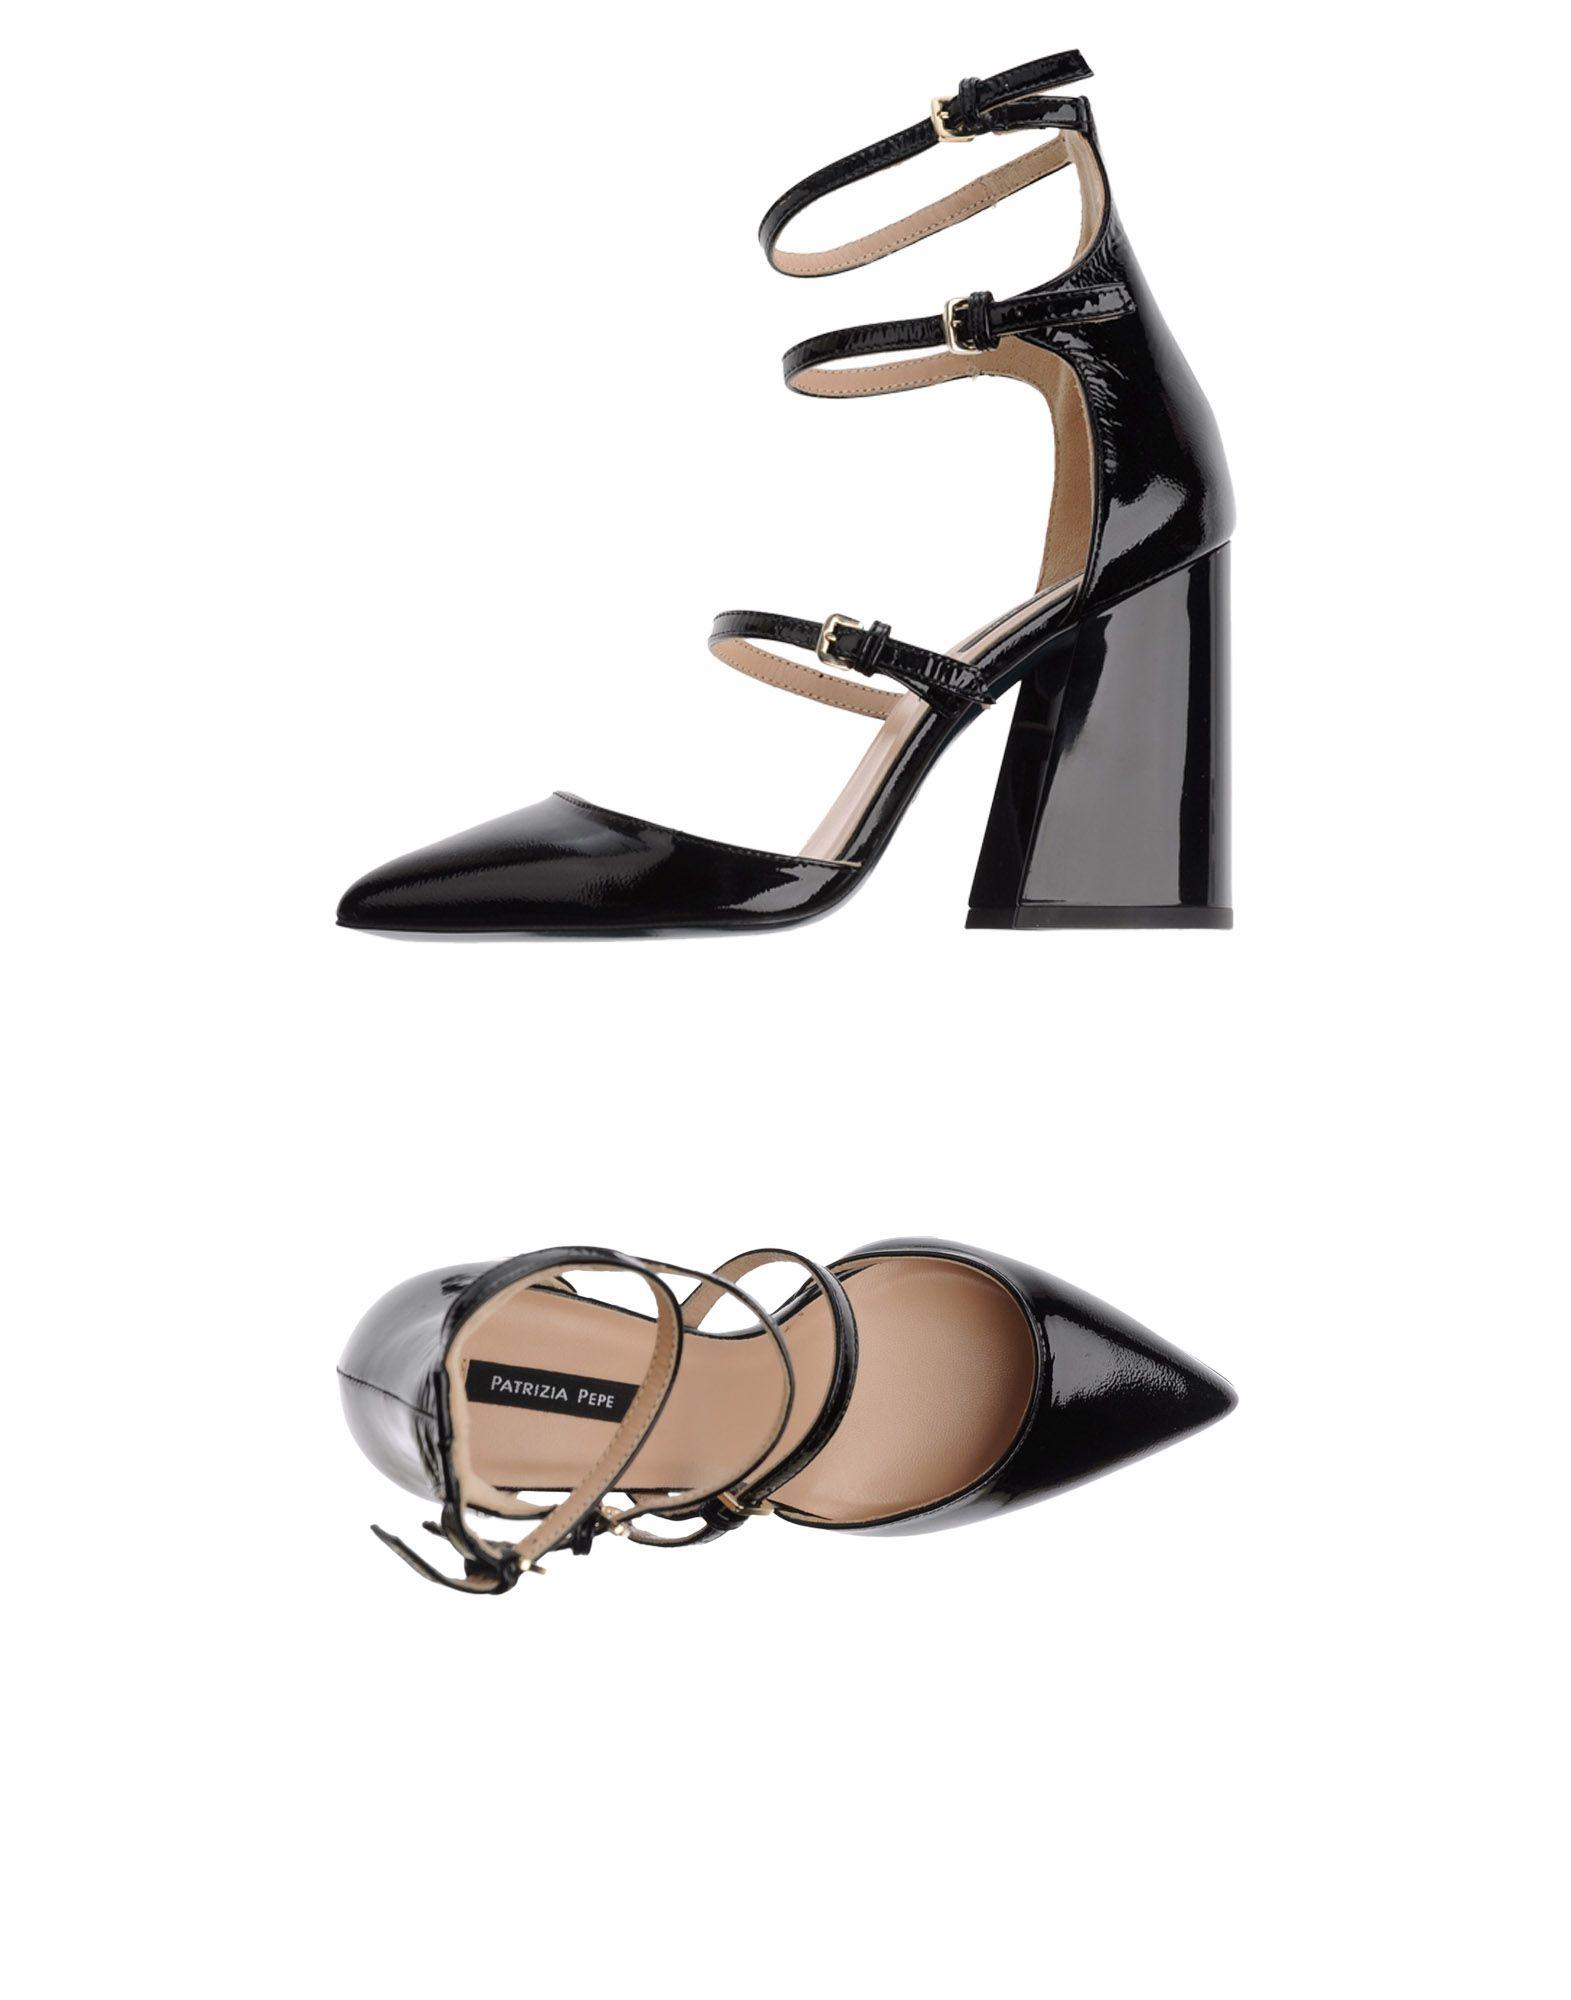 Stilvolle billige Schuhe Damen Patrizia Pepe Pumps Damen Schuhe  11240102VL 723990